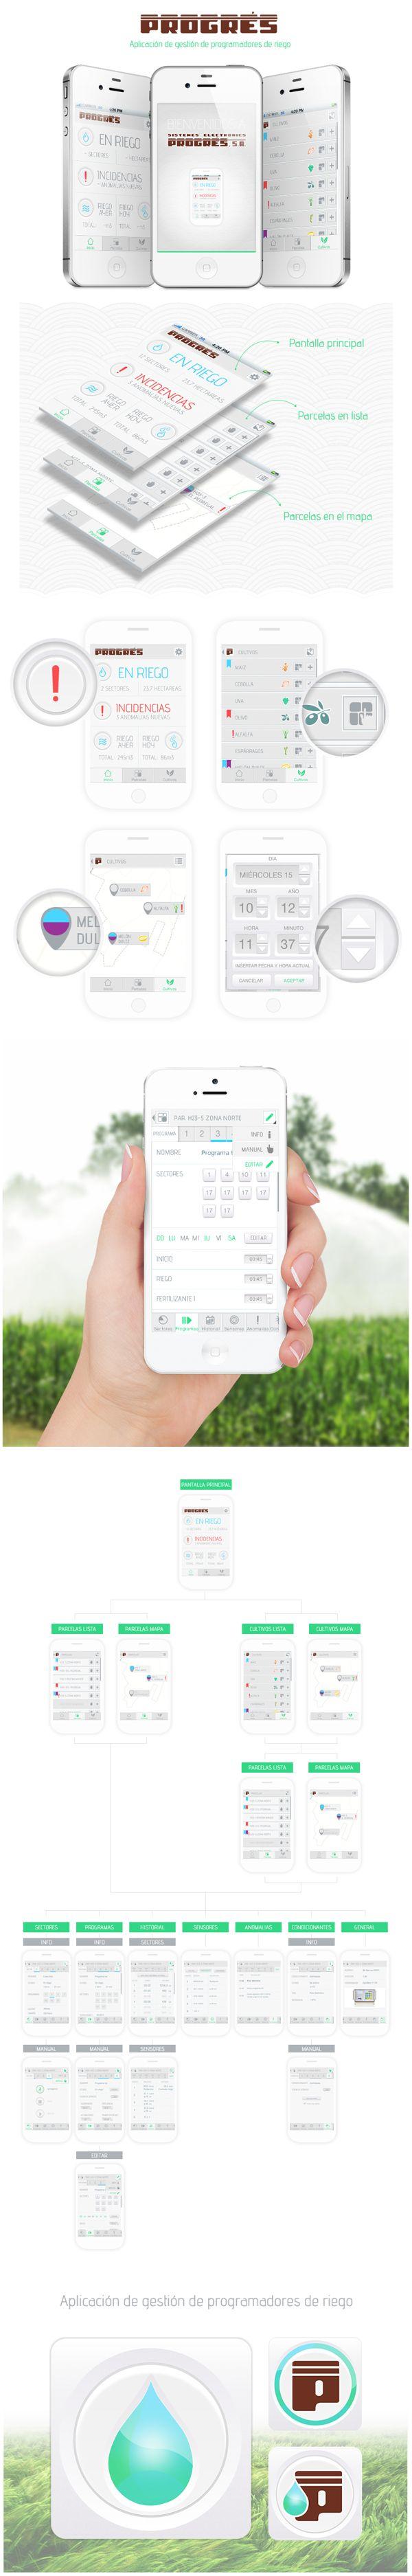 Progrés iOS App by #JuditSolsona, via Behance ios design apple irrigation app ui/ux mobile iphone